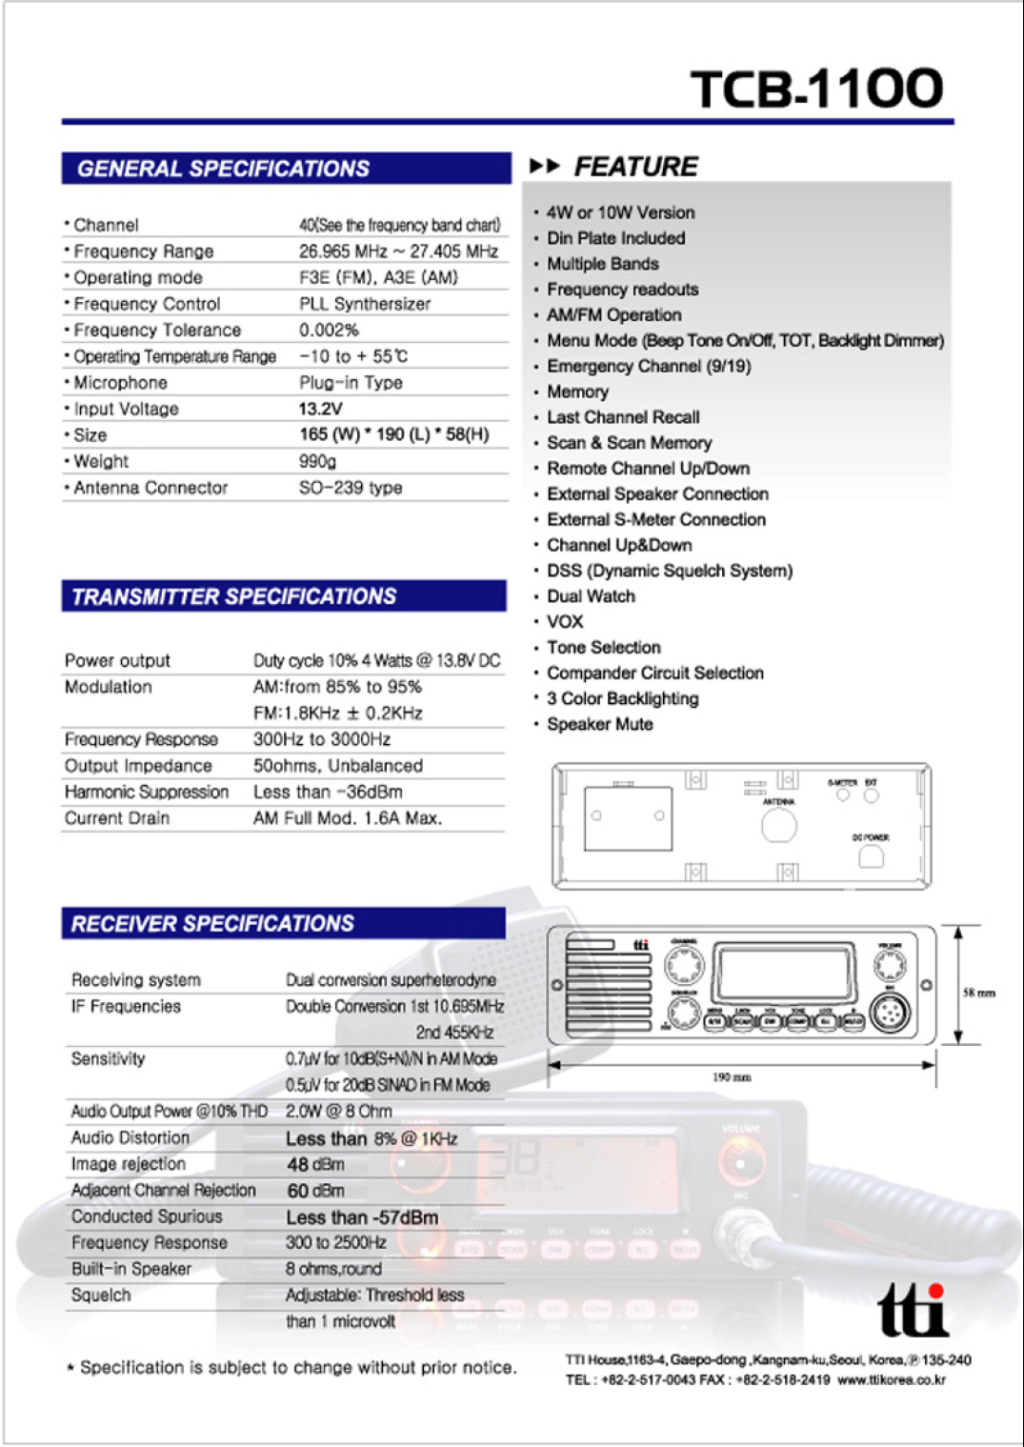 tti TCB-1100 (Routier) Captu879